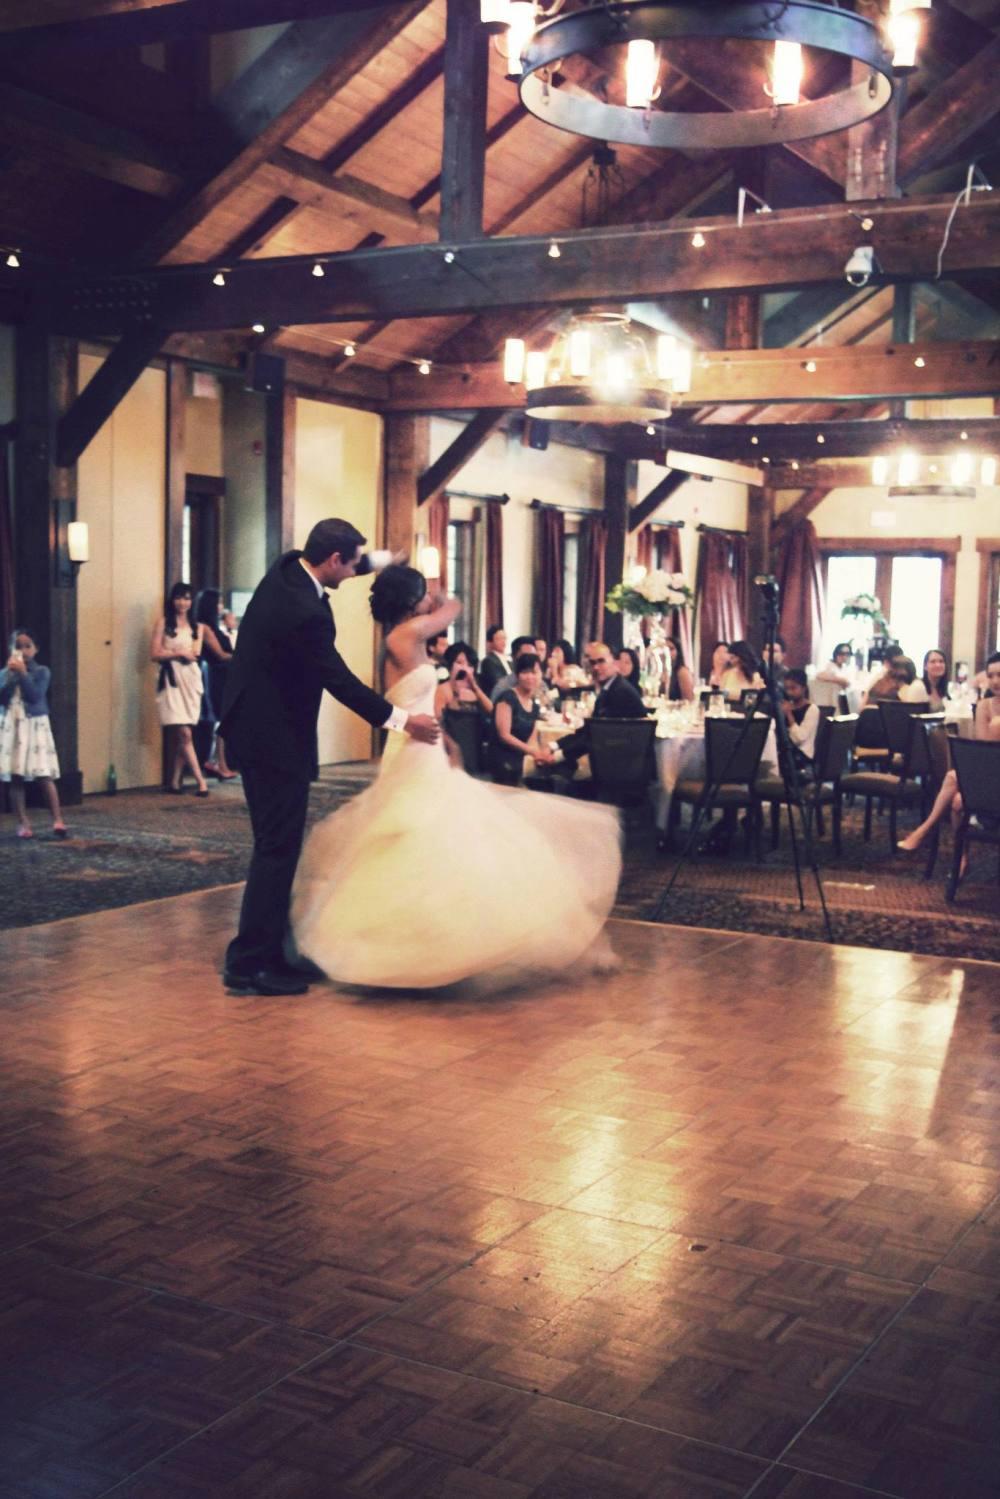 Soundslikeknock first wedding dance photo